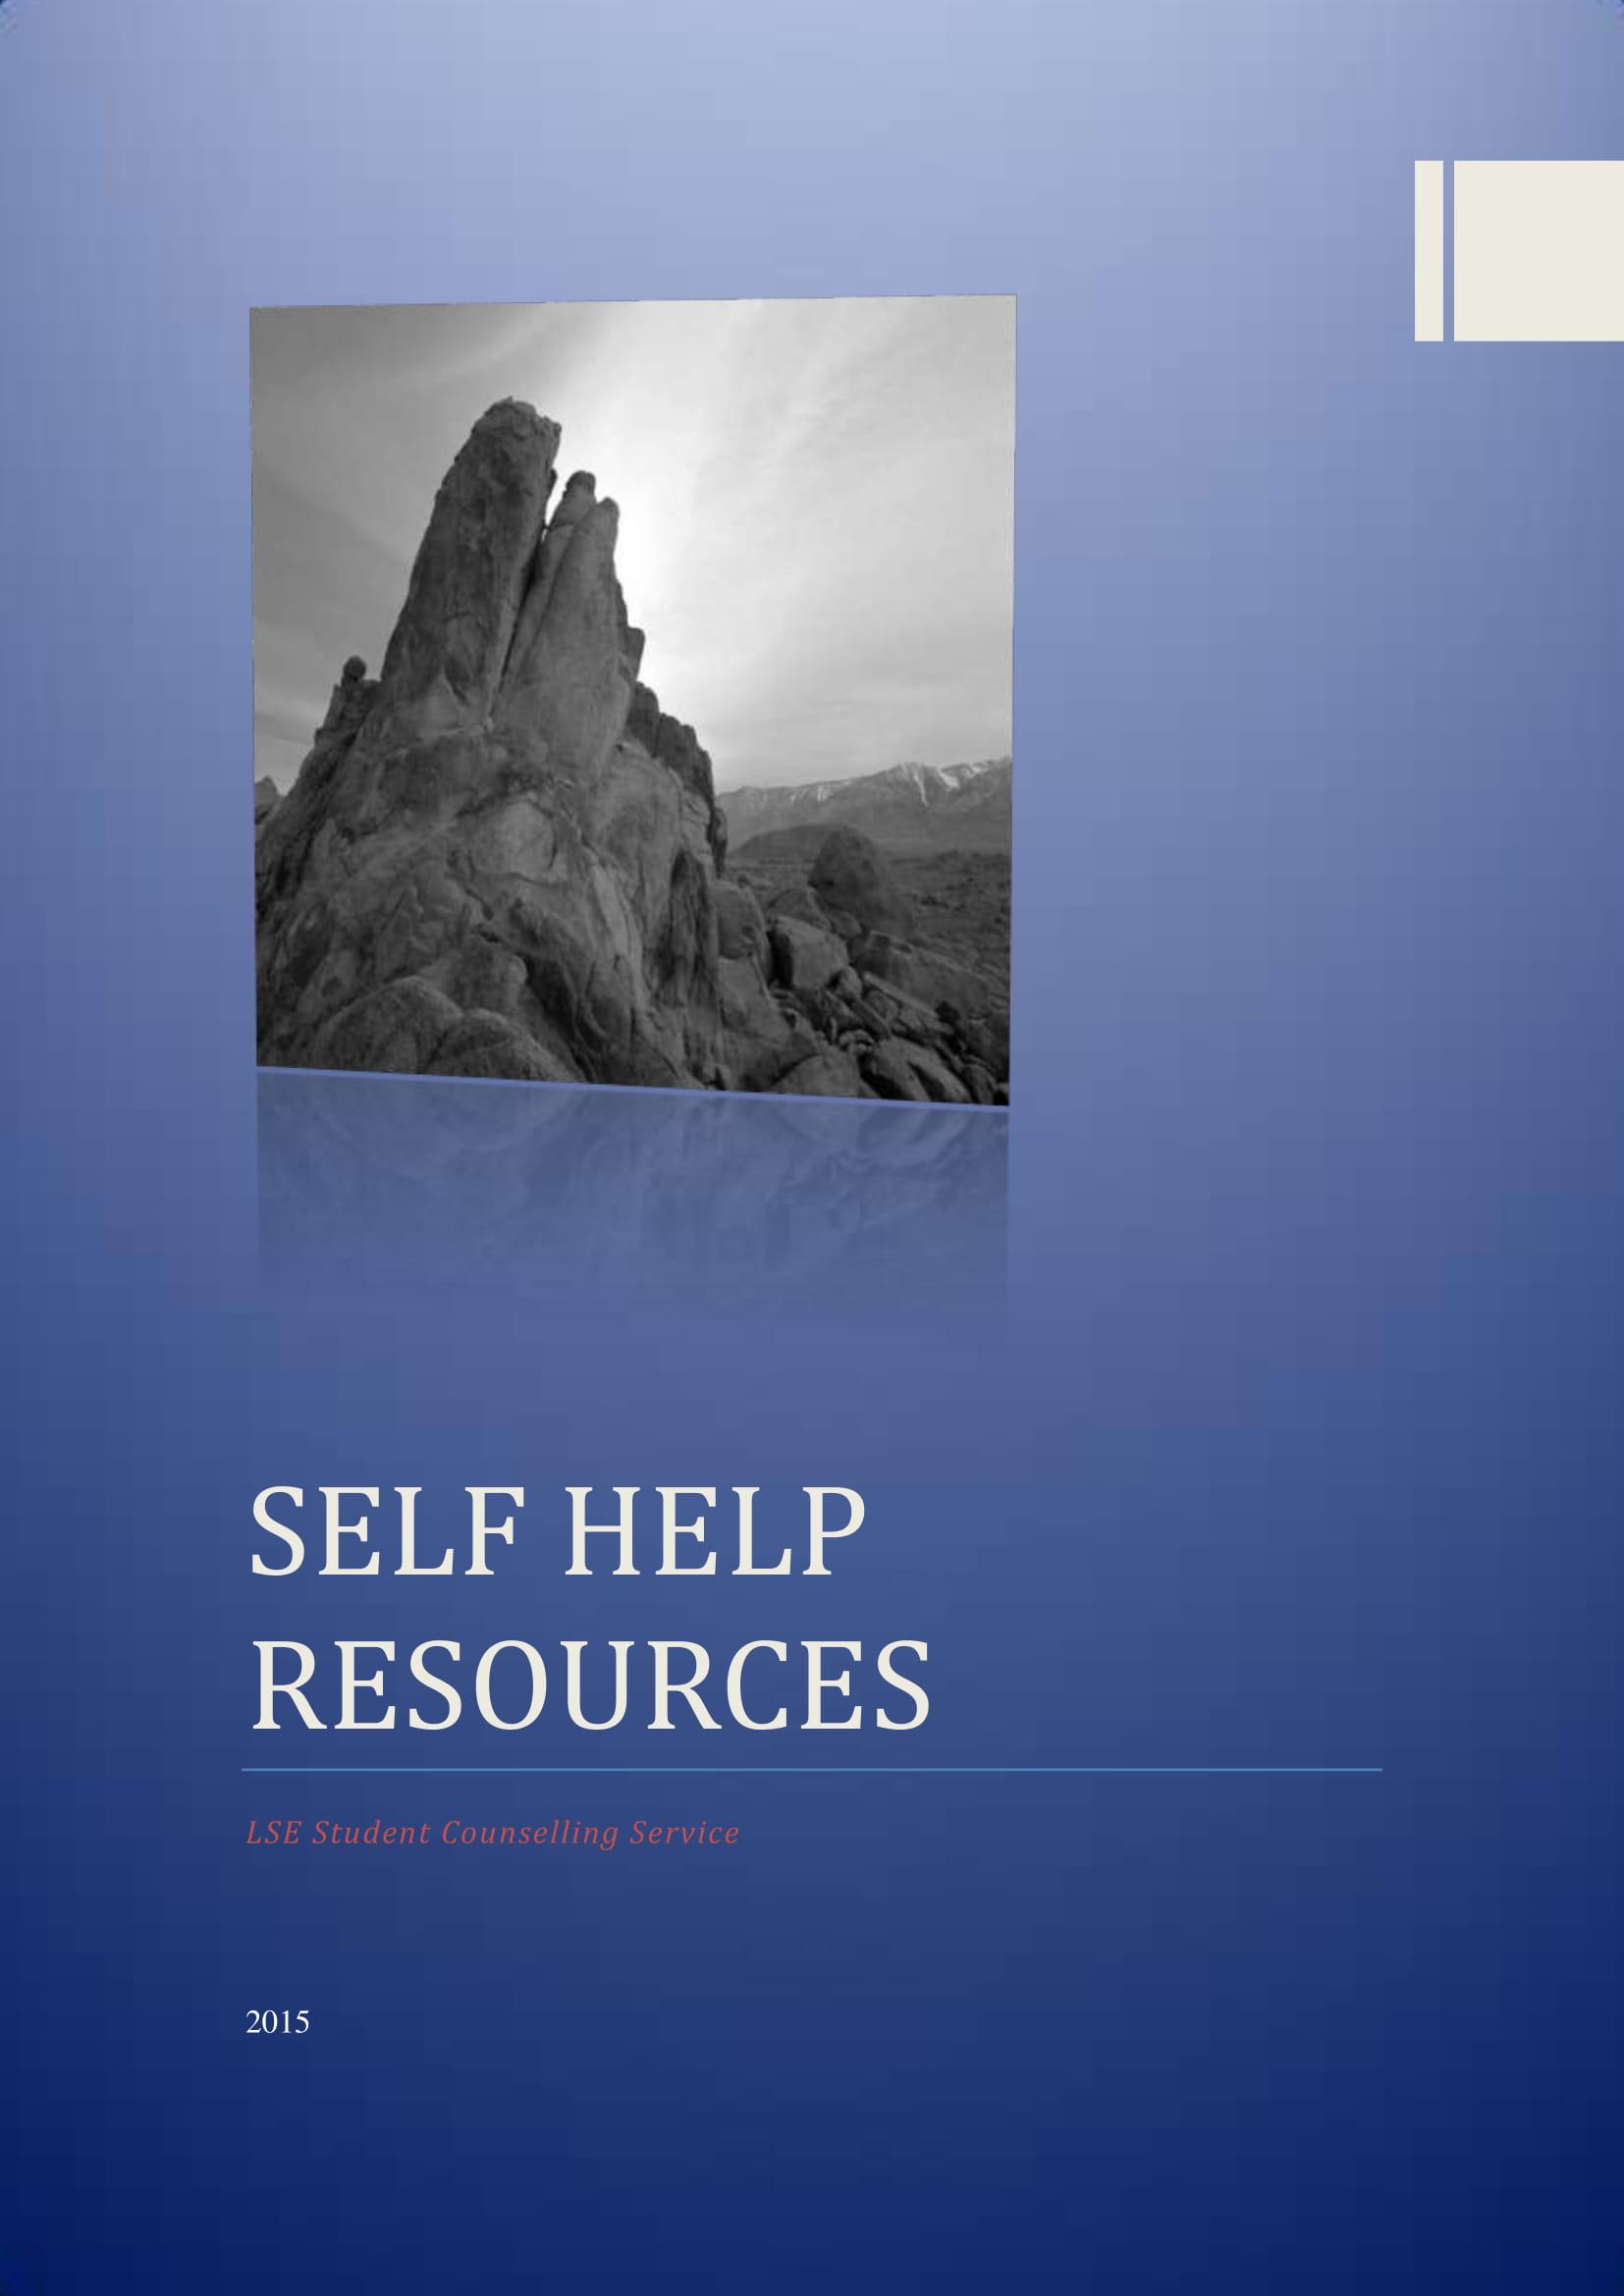 scs self help guide